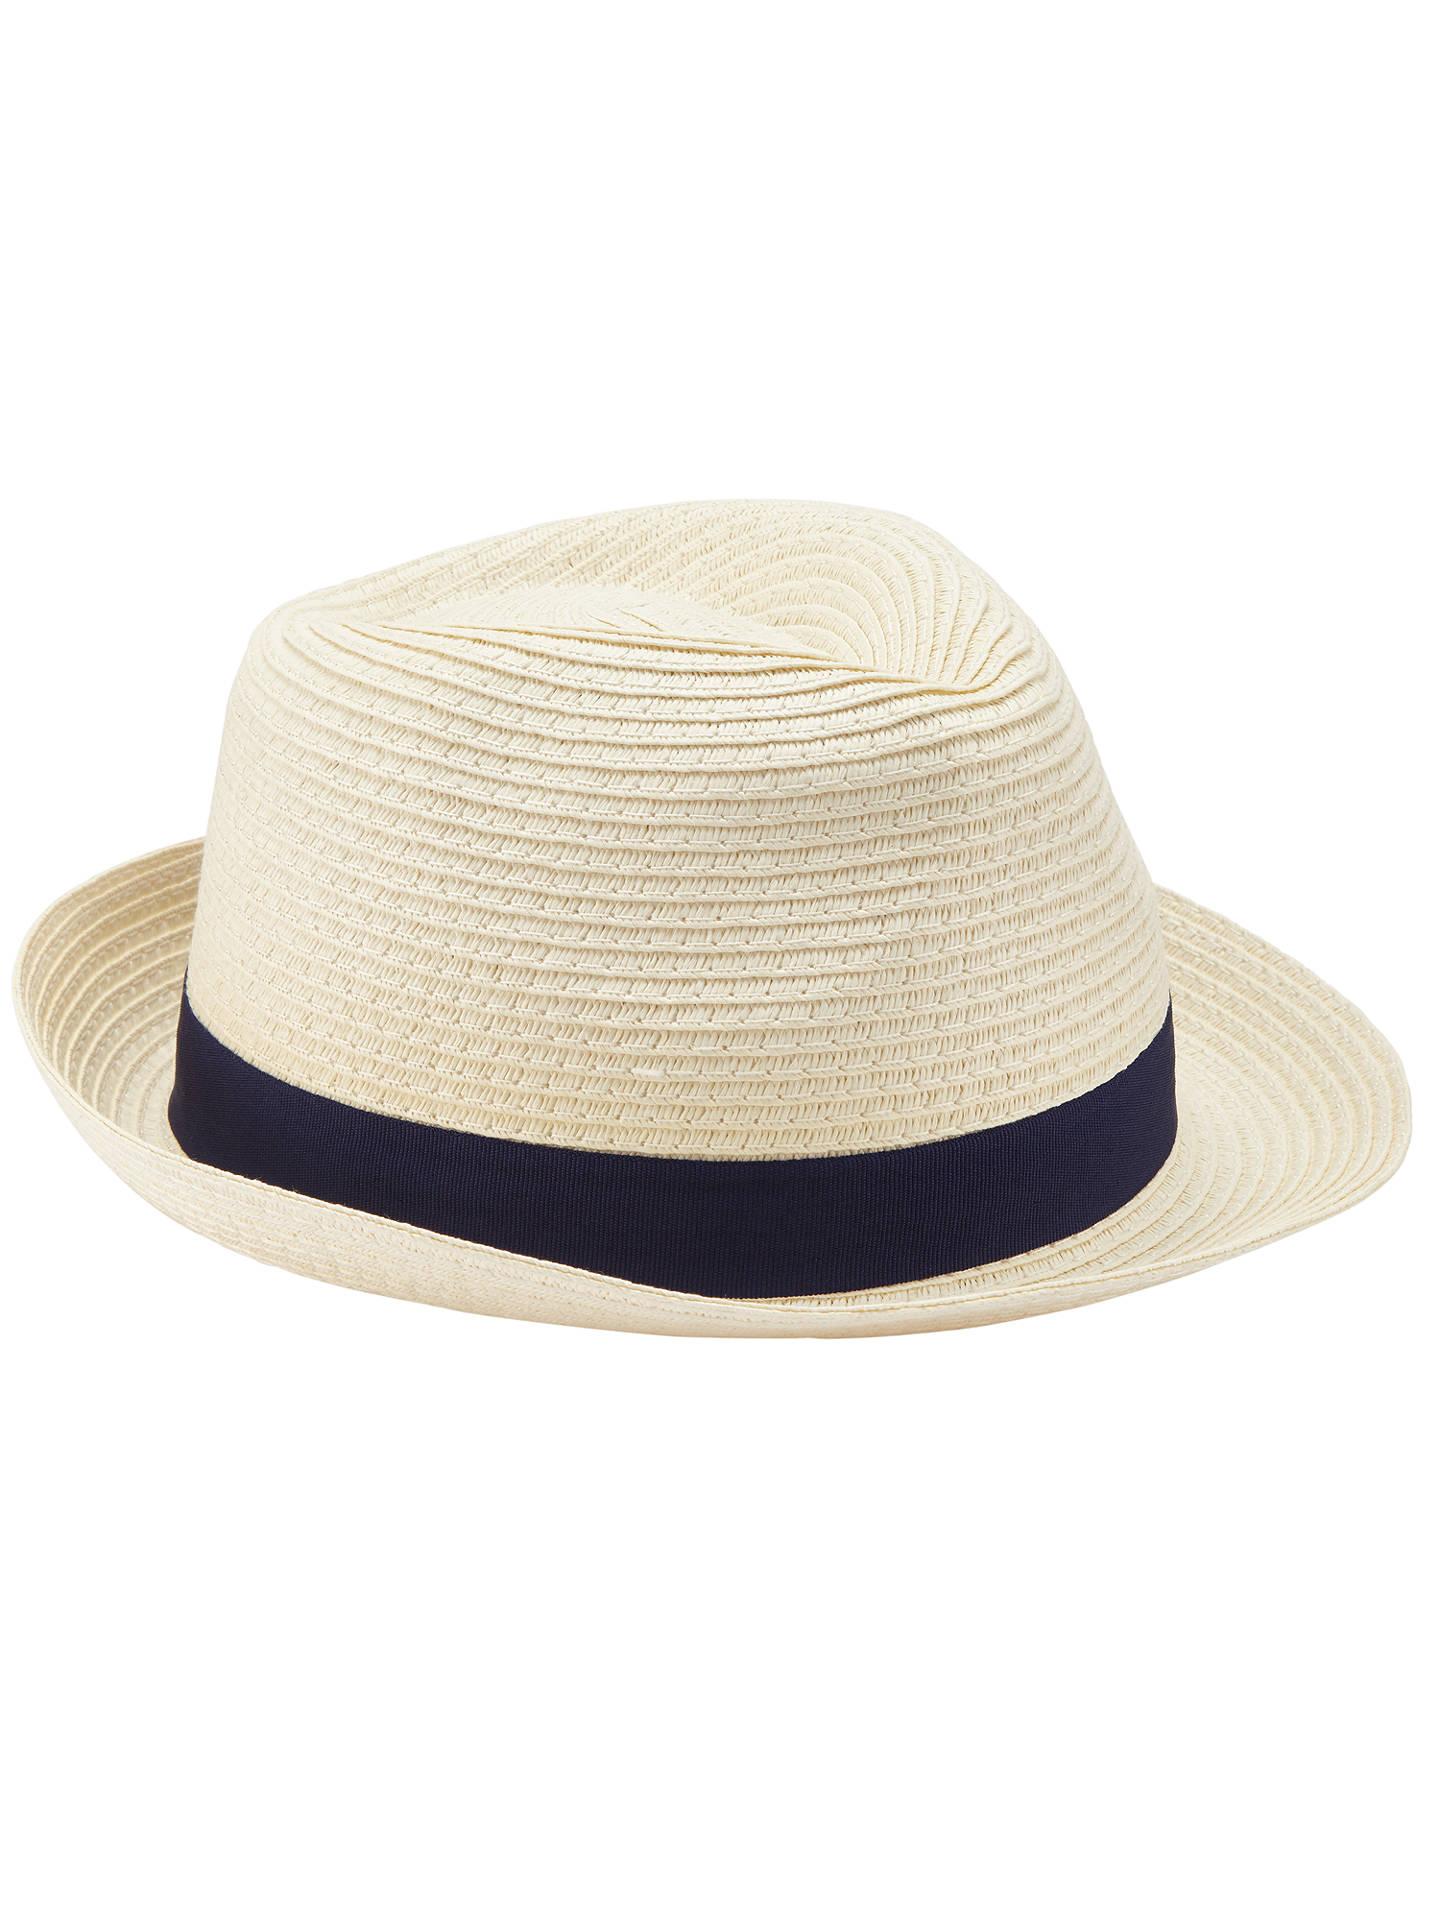 BuyJohn Lewis Packable Braid Trilby Hat d712902aaff9